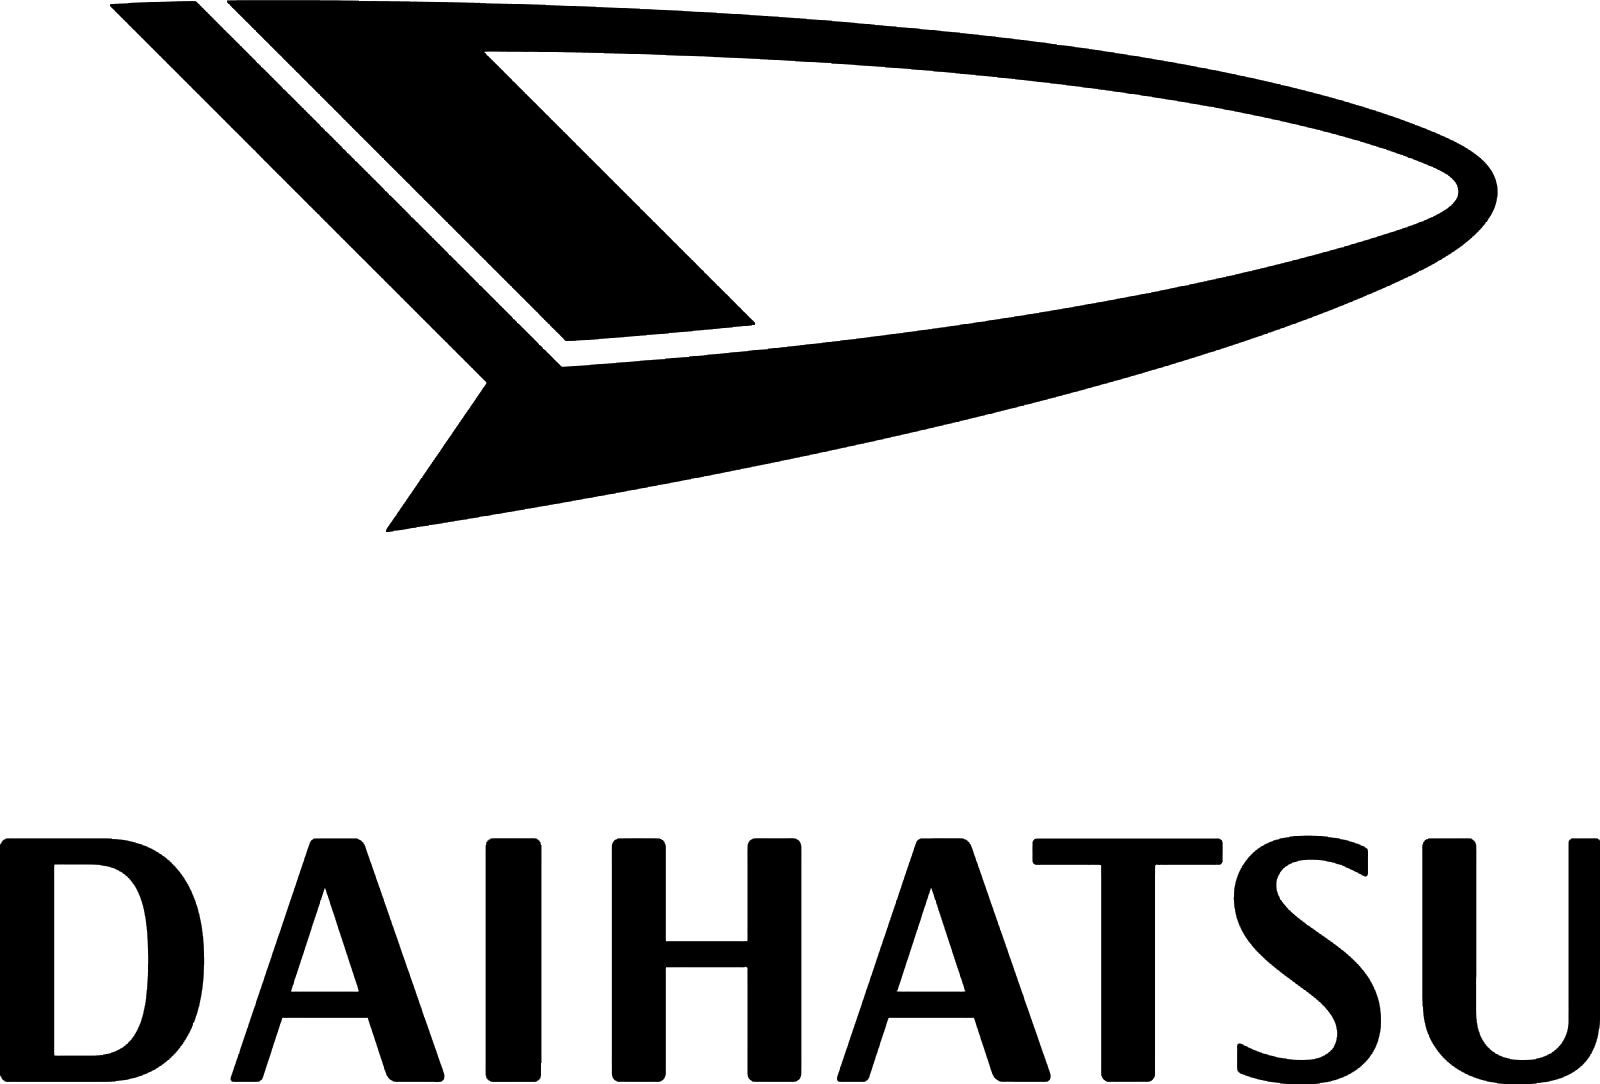 daihatsu logo  hd  png  meaning  information